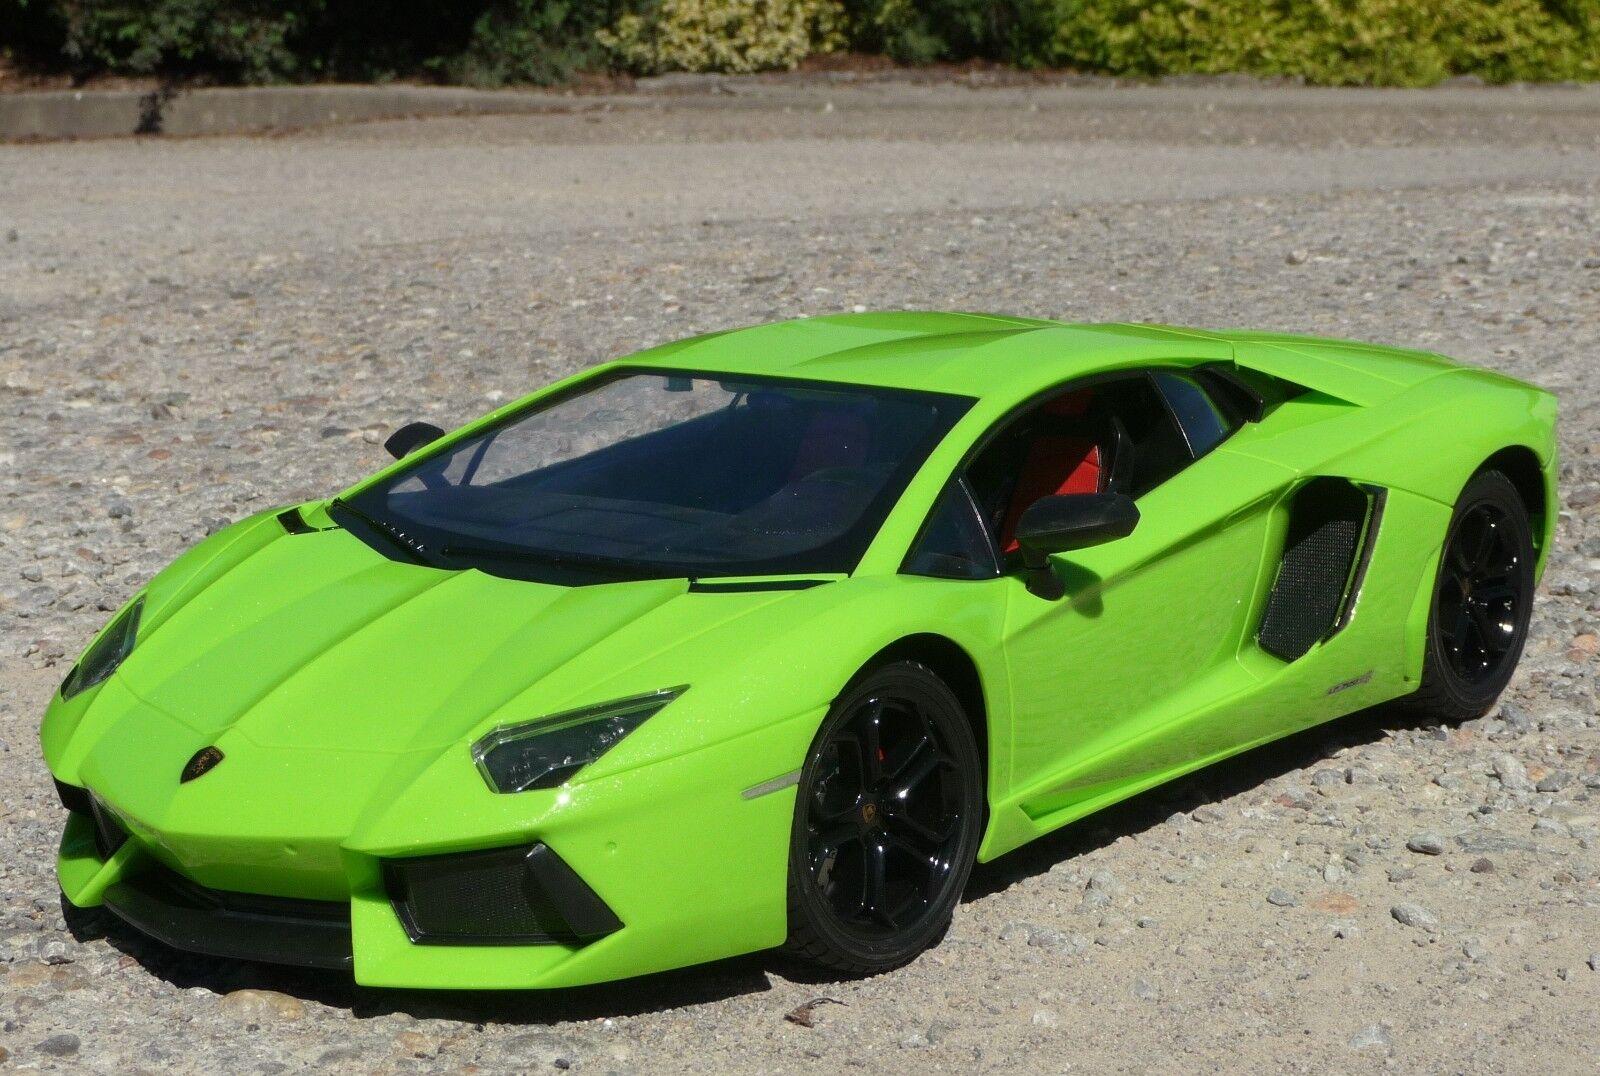 RC Lamborghini Aventador mit AKKU & LICHT 1 10 50011 L=48cm Ferngesteuert 2.4GHz 50011 10 fe679a